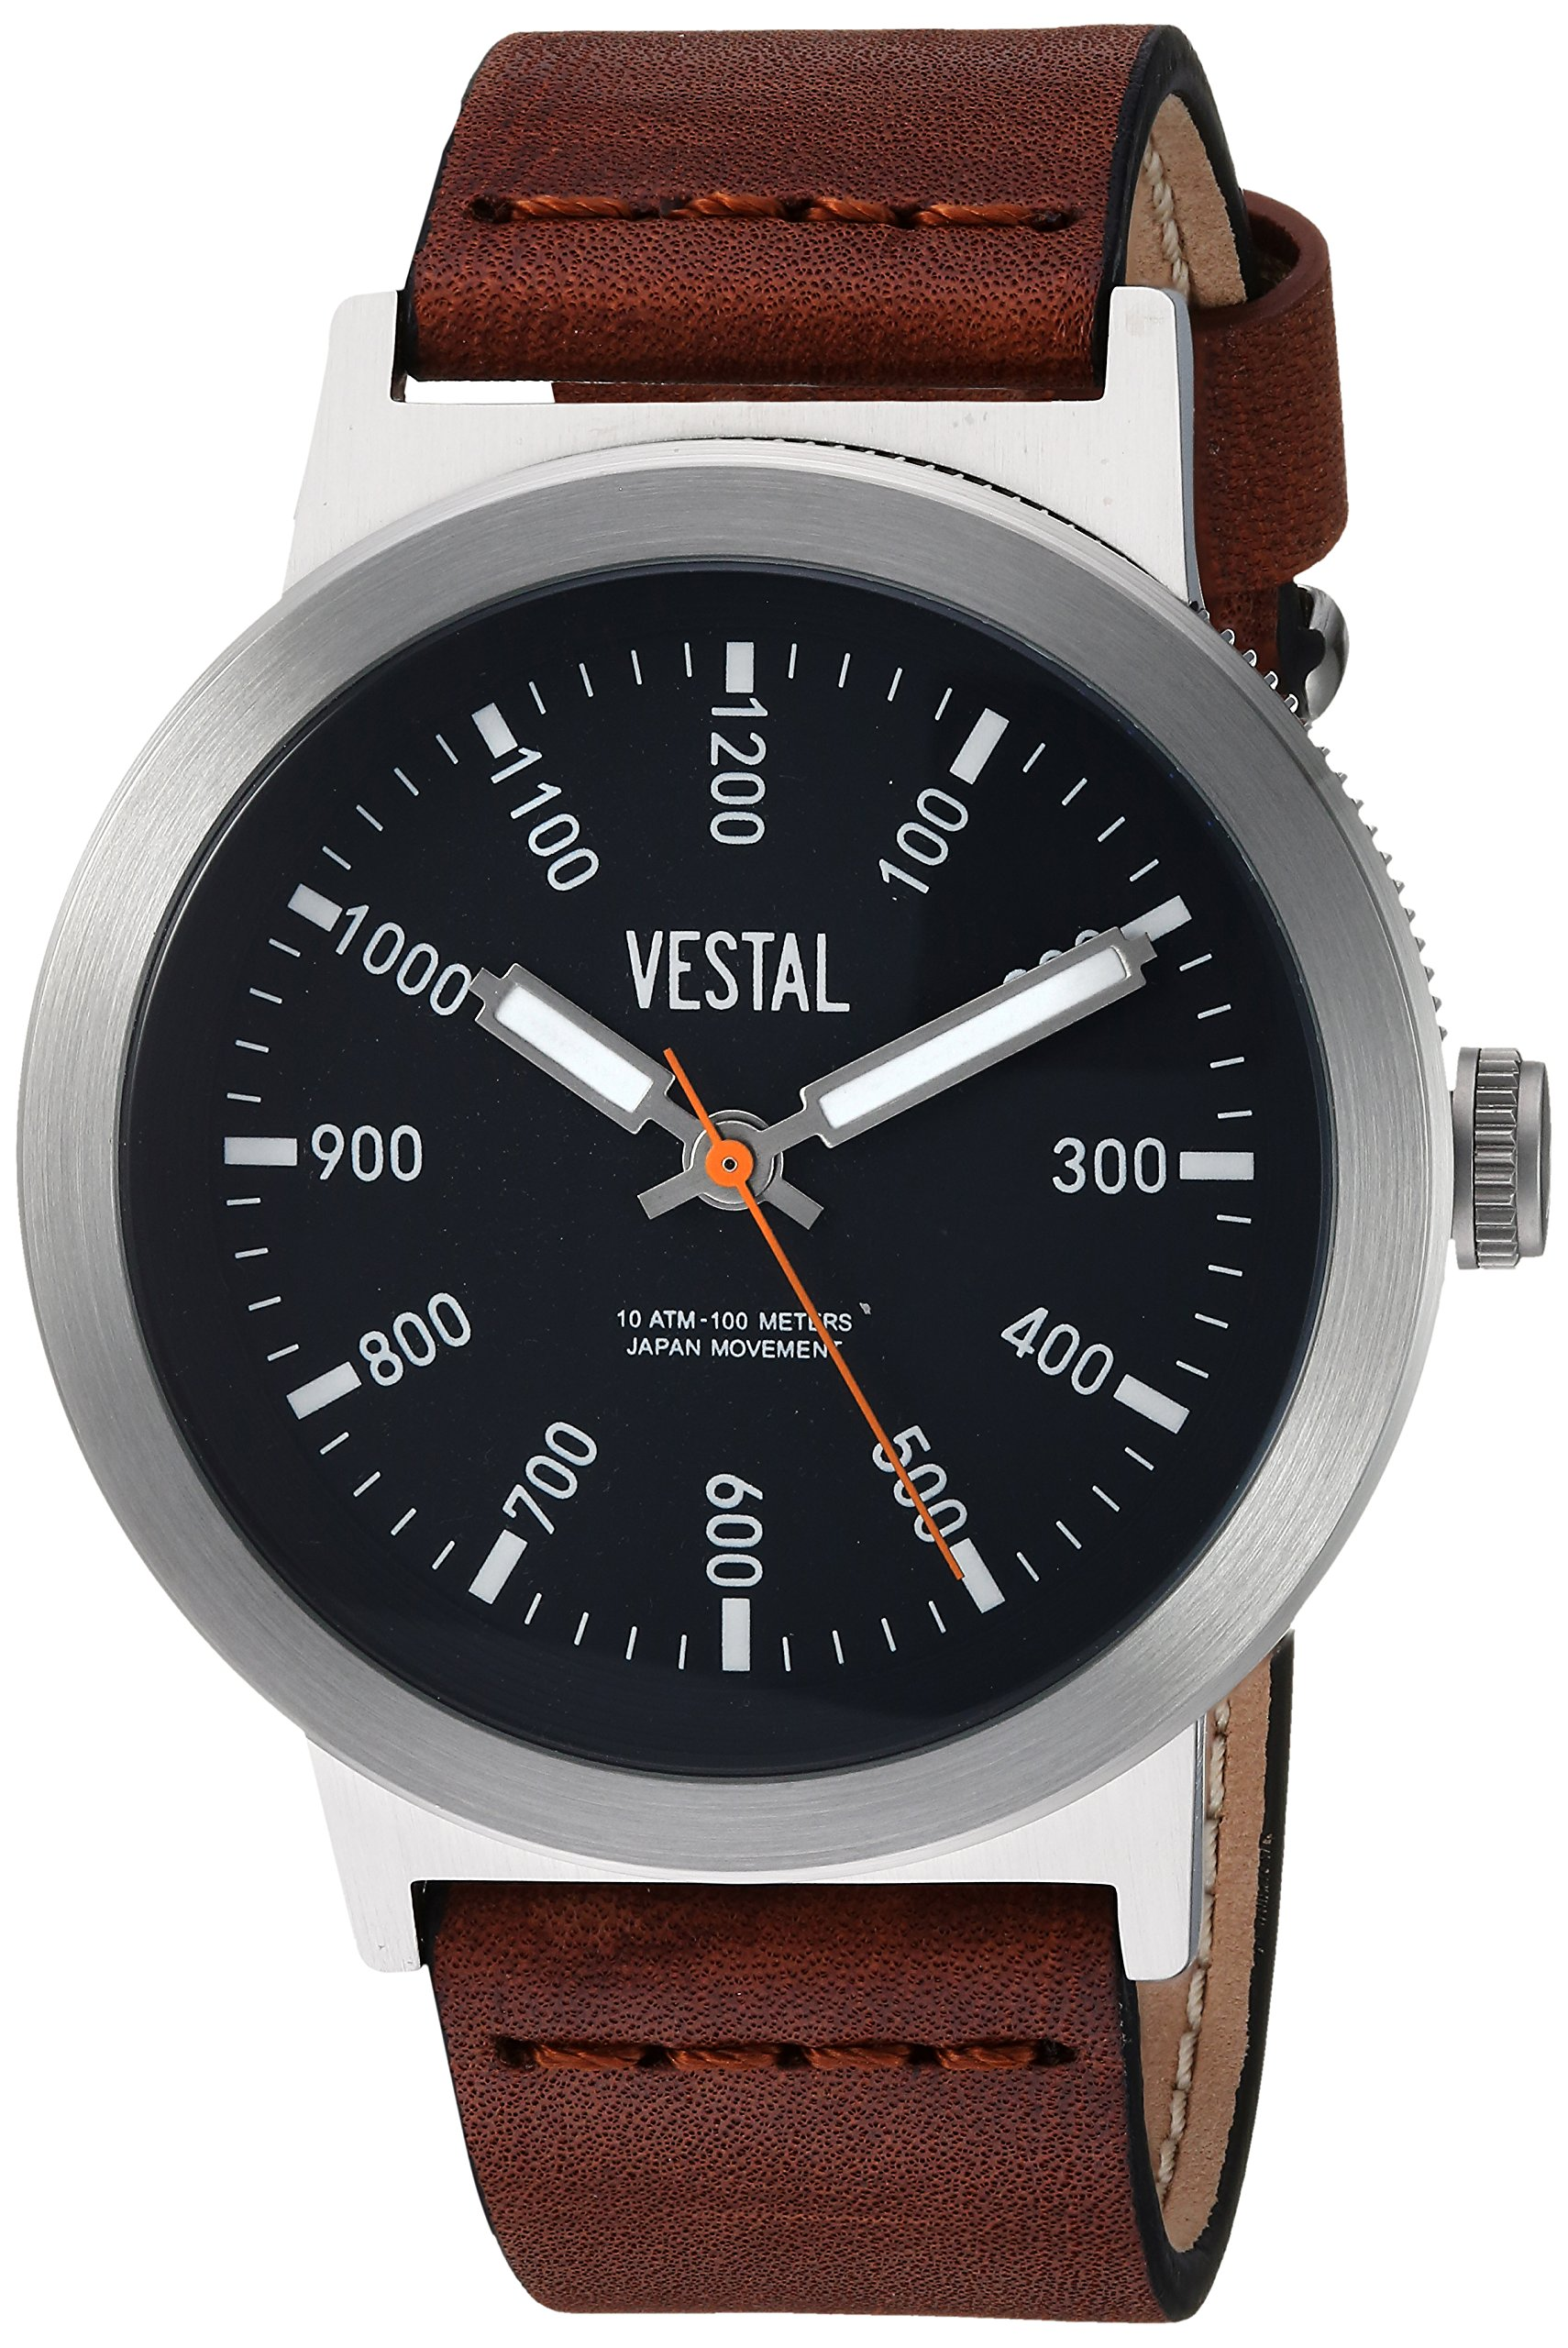 Vestal Men's Retrofocus Stainless Steel Japanese-Quartz Watch with Leather Strap, Brown, 21.7 (Model: SLR443L01.BRBK